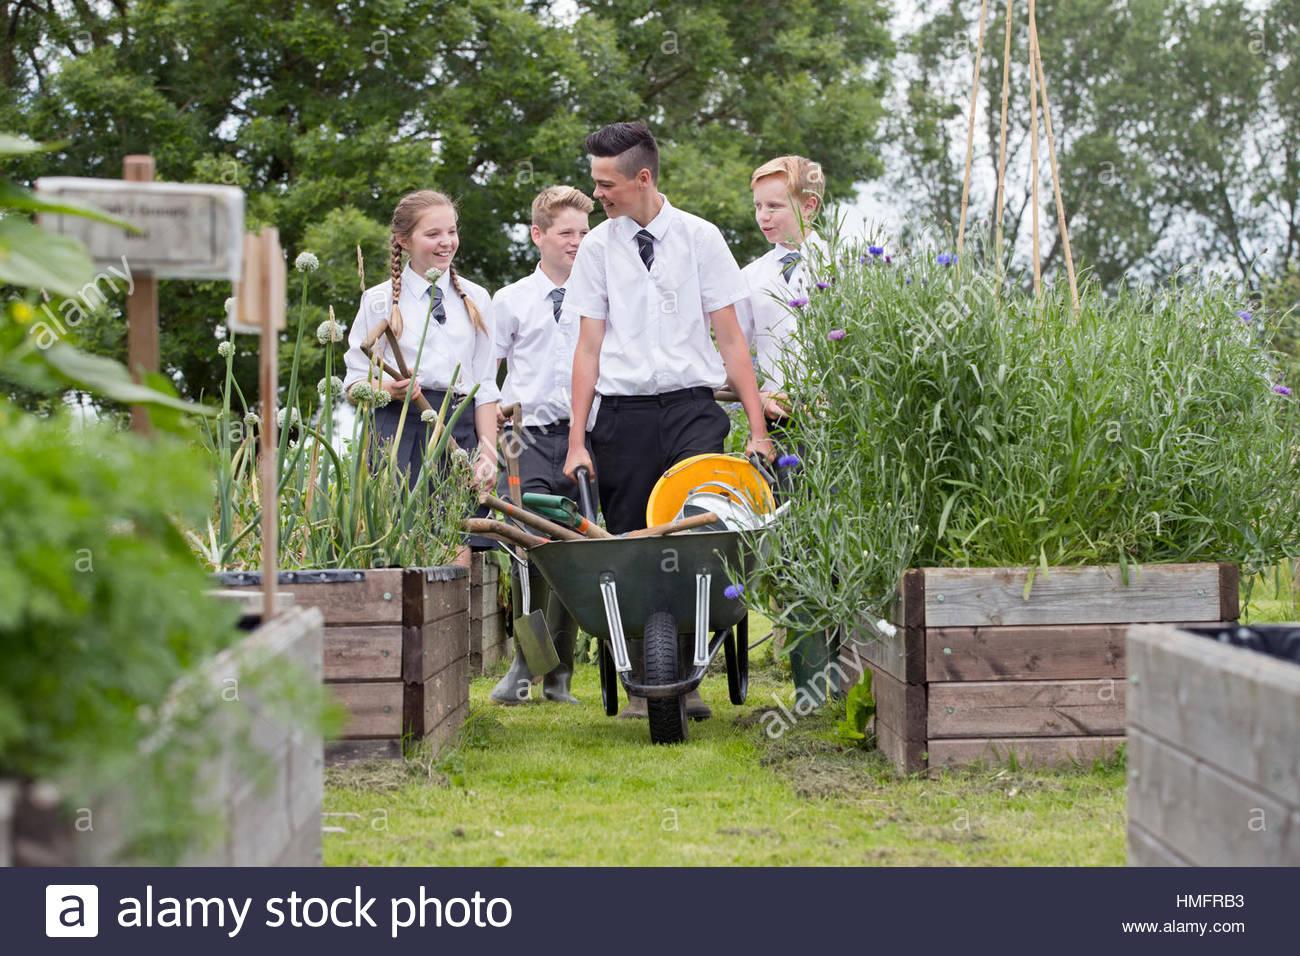 School vegetable gardens - Middle School Students With Wheelbarrow Learning Gardening In Vegetable Garden